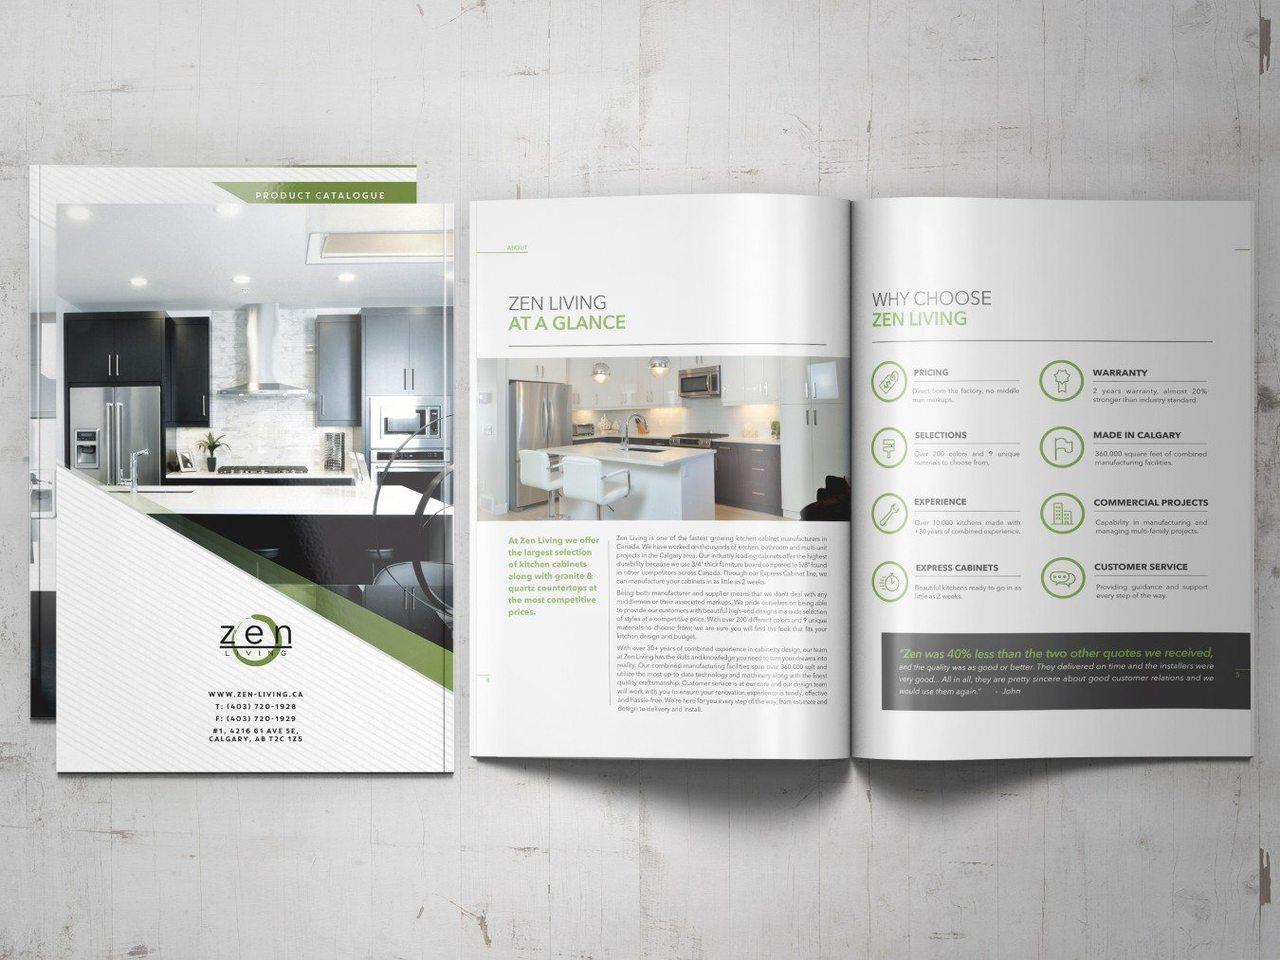 Zen_Living_Catalogue_Presentation_04